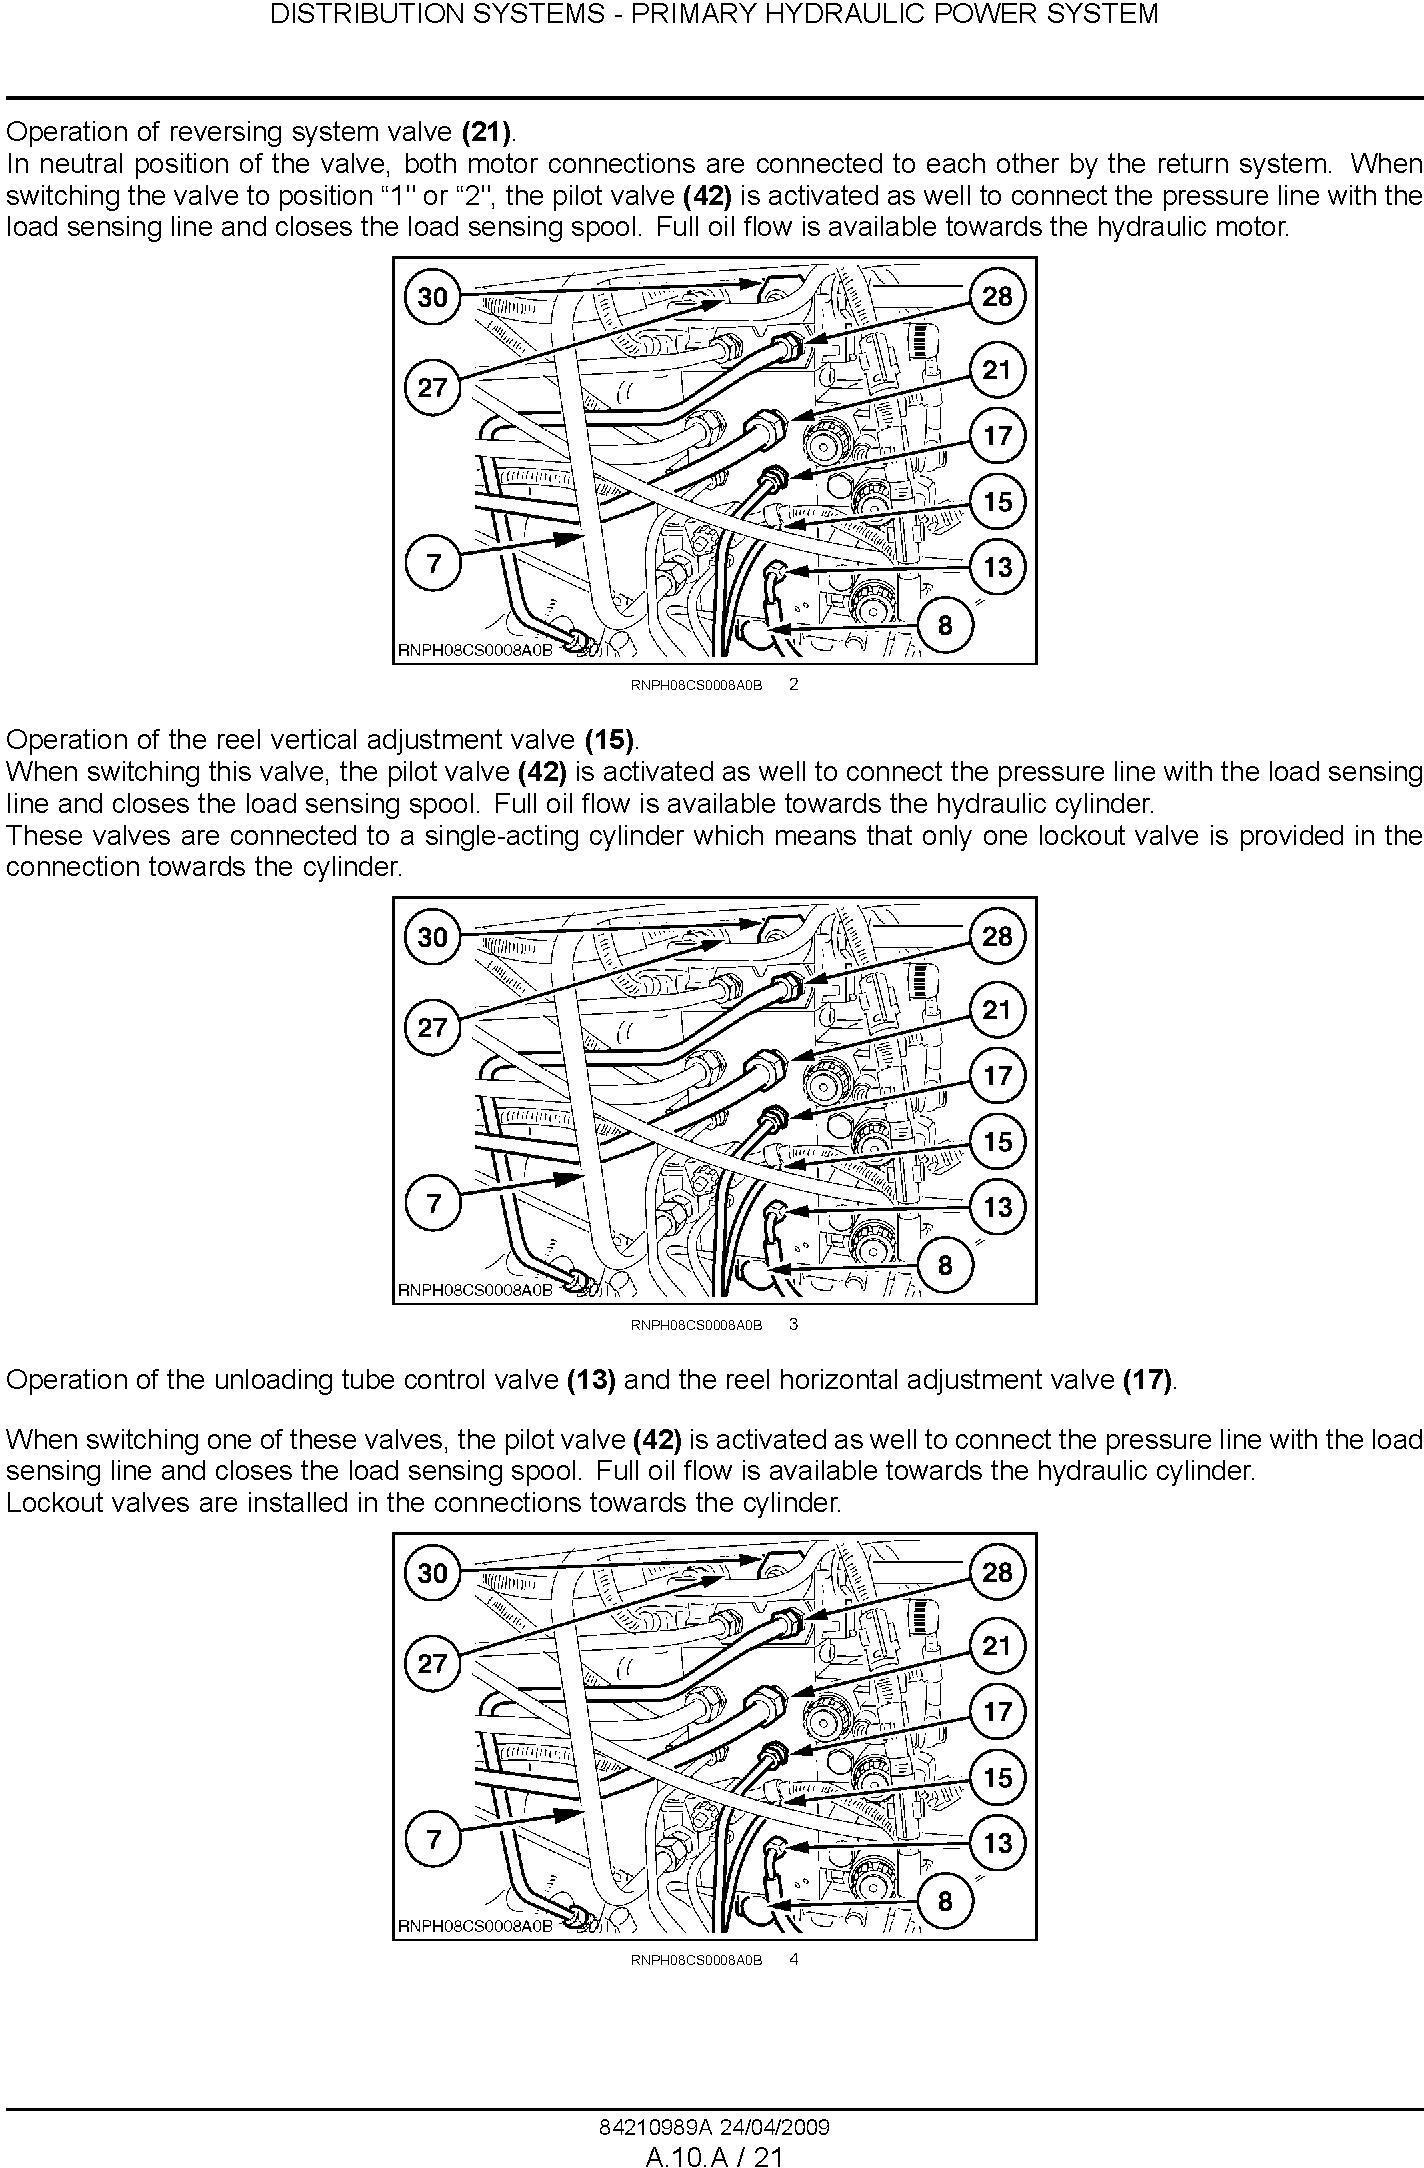 New Holland CSX7040, CSX7050, CSX7060, CSX7070, CSX7080 Combine Service Manual - 2